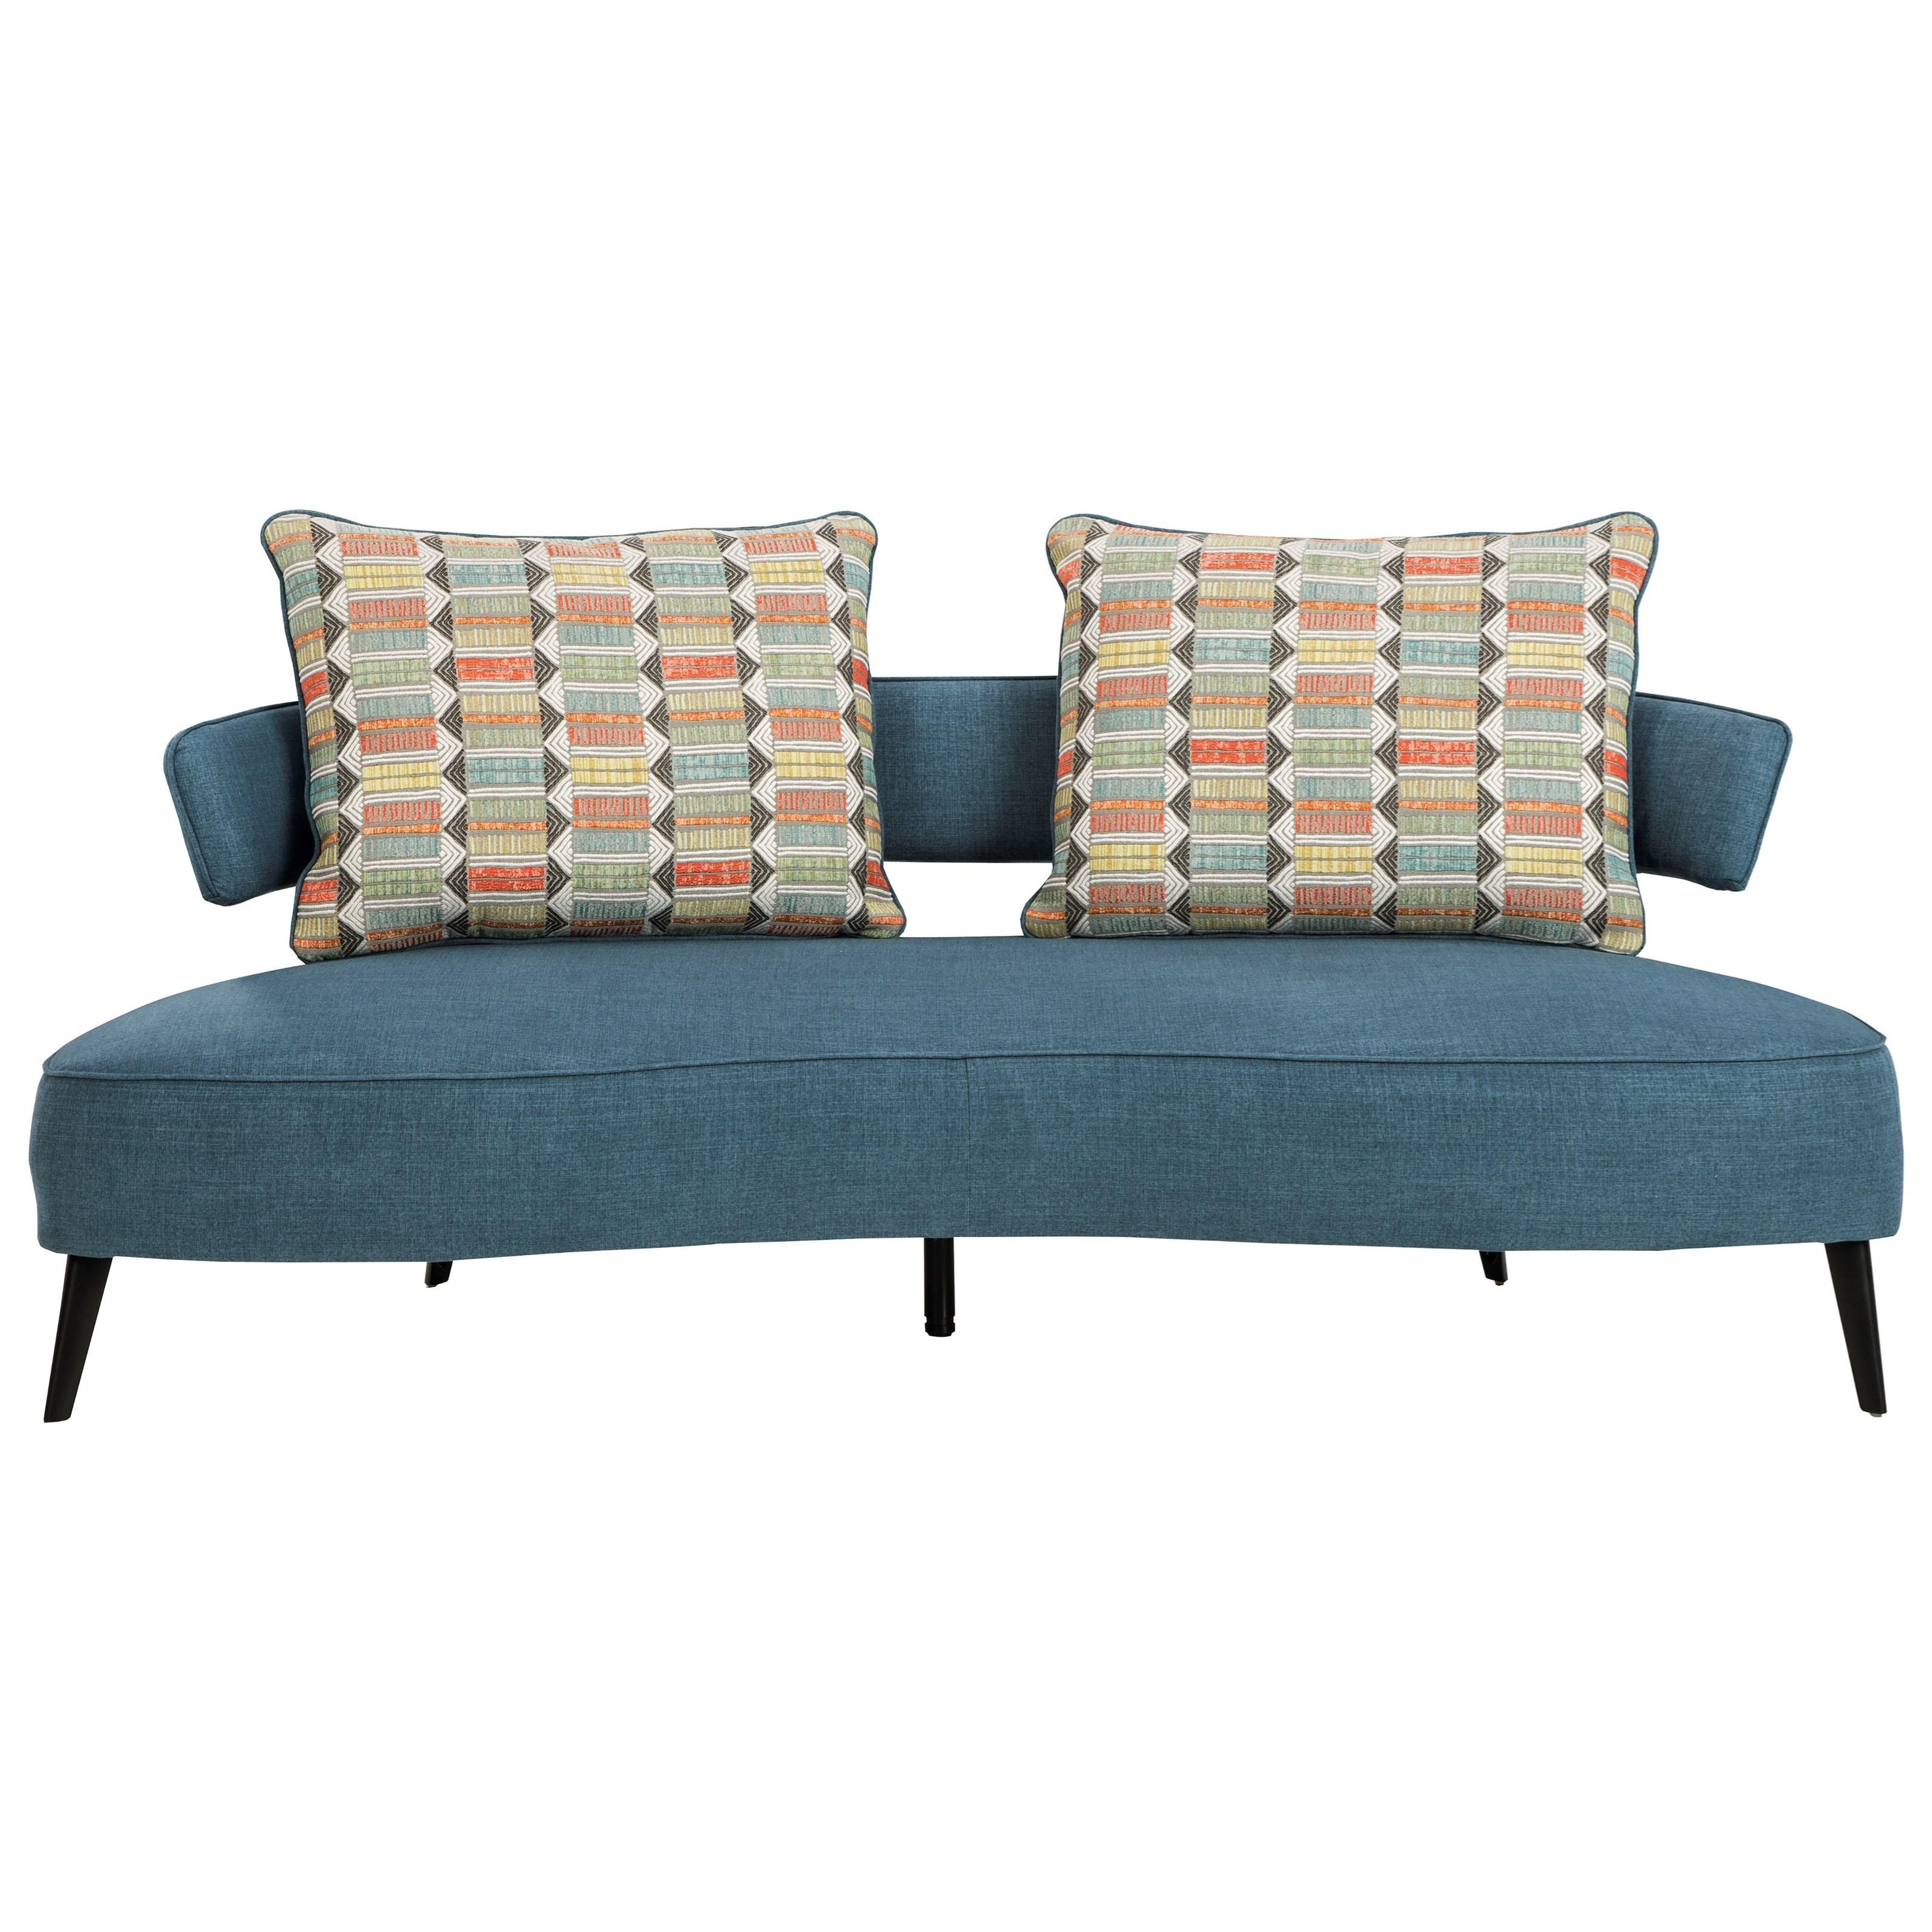 Hollyann Sofa by Signature at Walker's Furniture